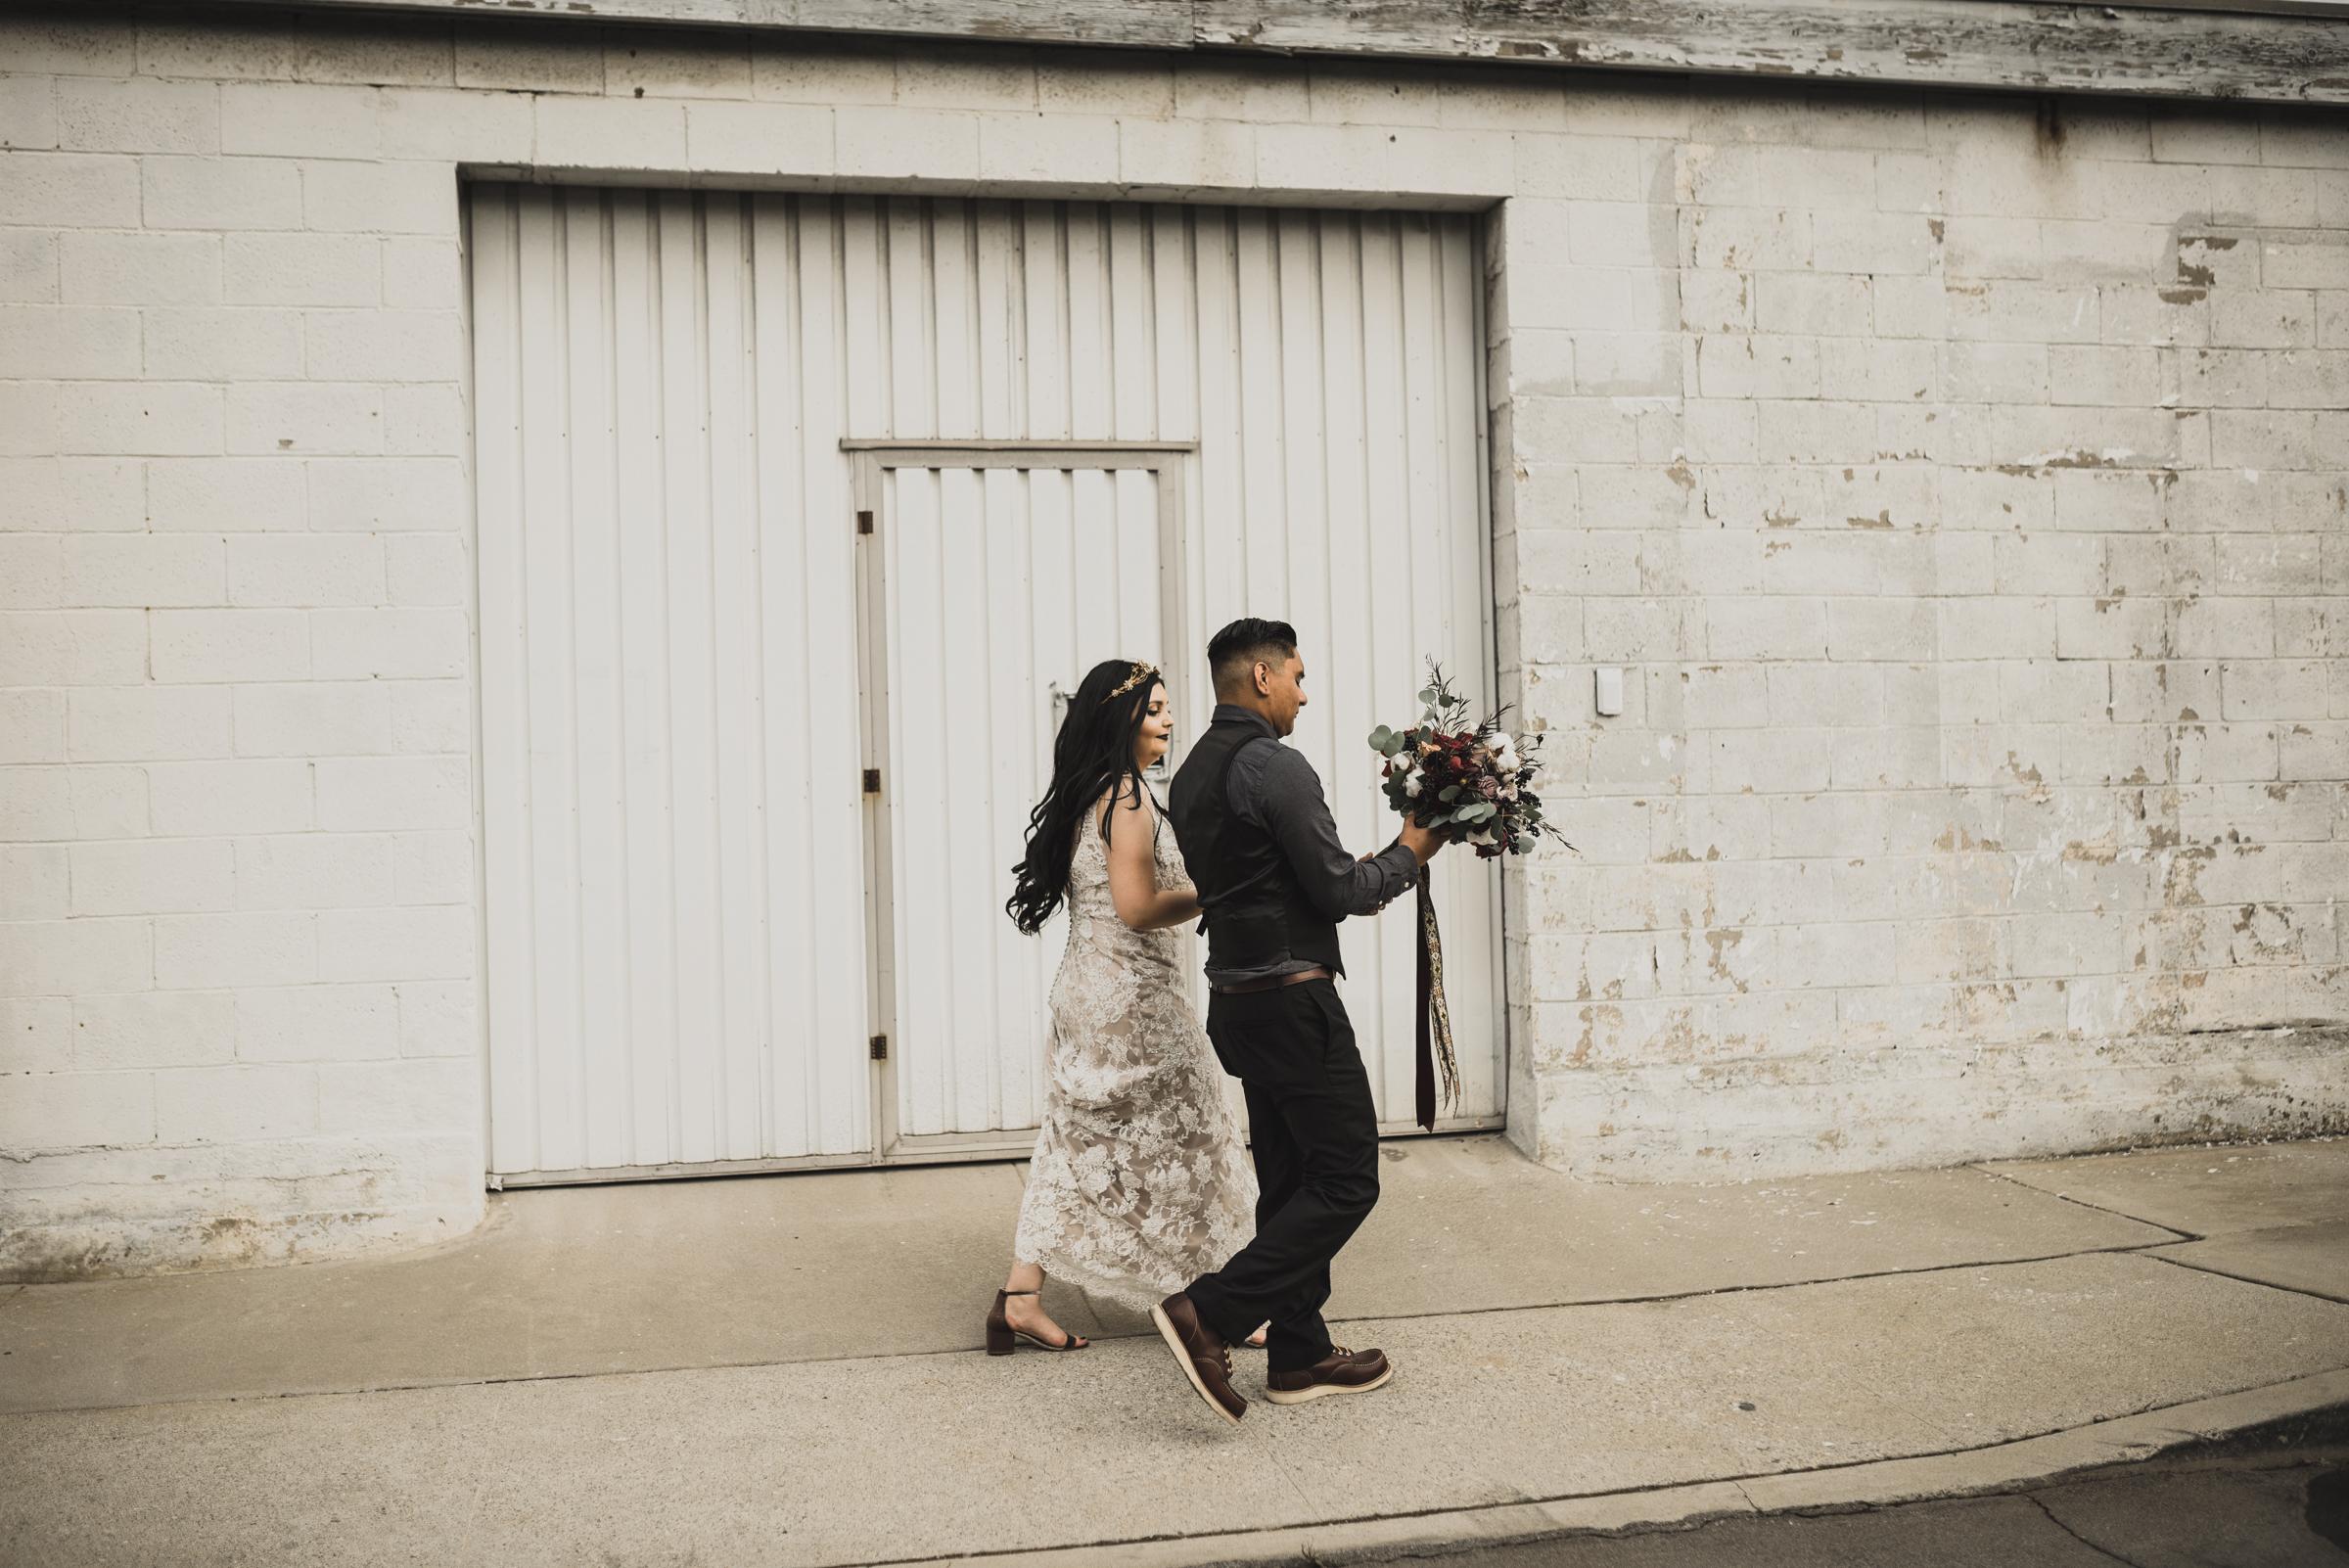 ©Isaiah + Taylor Photography - Smoky Hollow Studios Wedding, El Segundo, Los Angeles Wedding Photographer-91.jpg